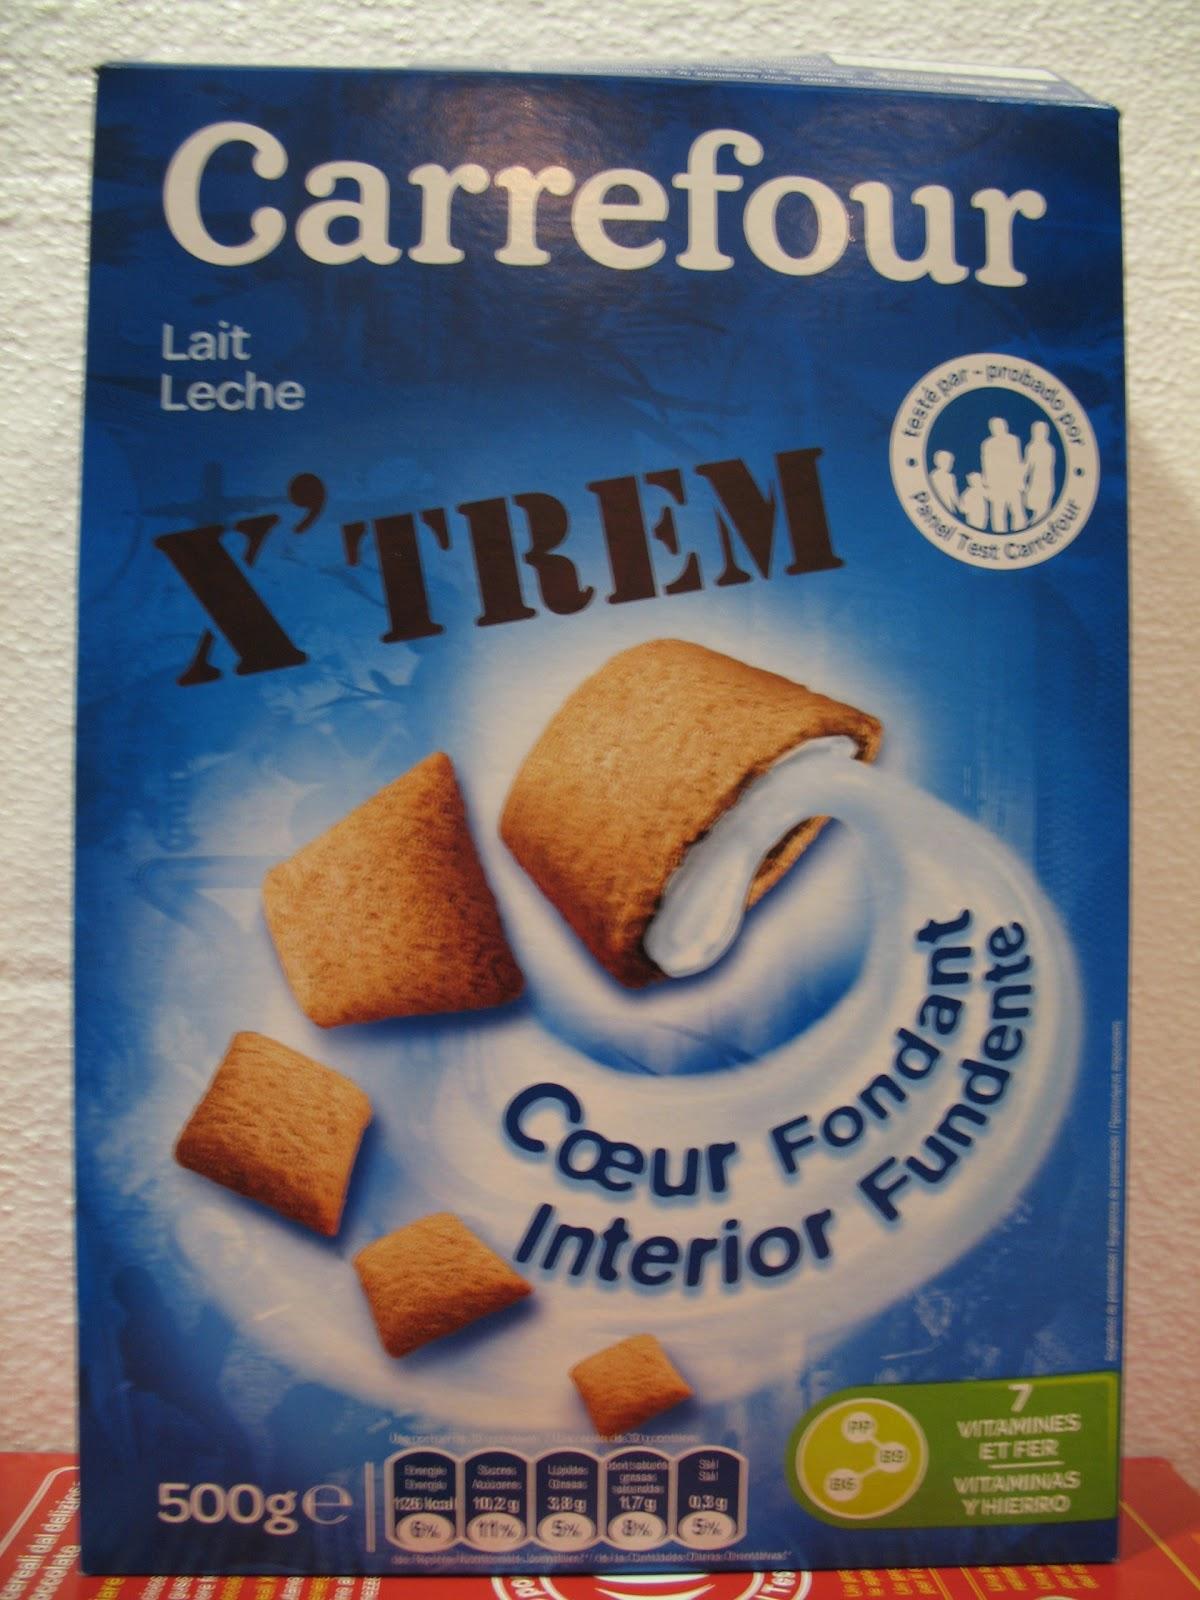 Simplemente ideas cereales carrefour - Relleno nordico carrefour ...